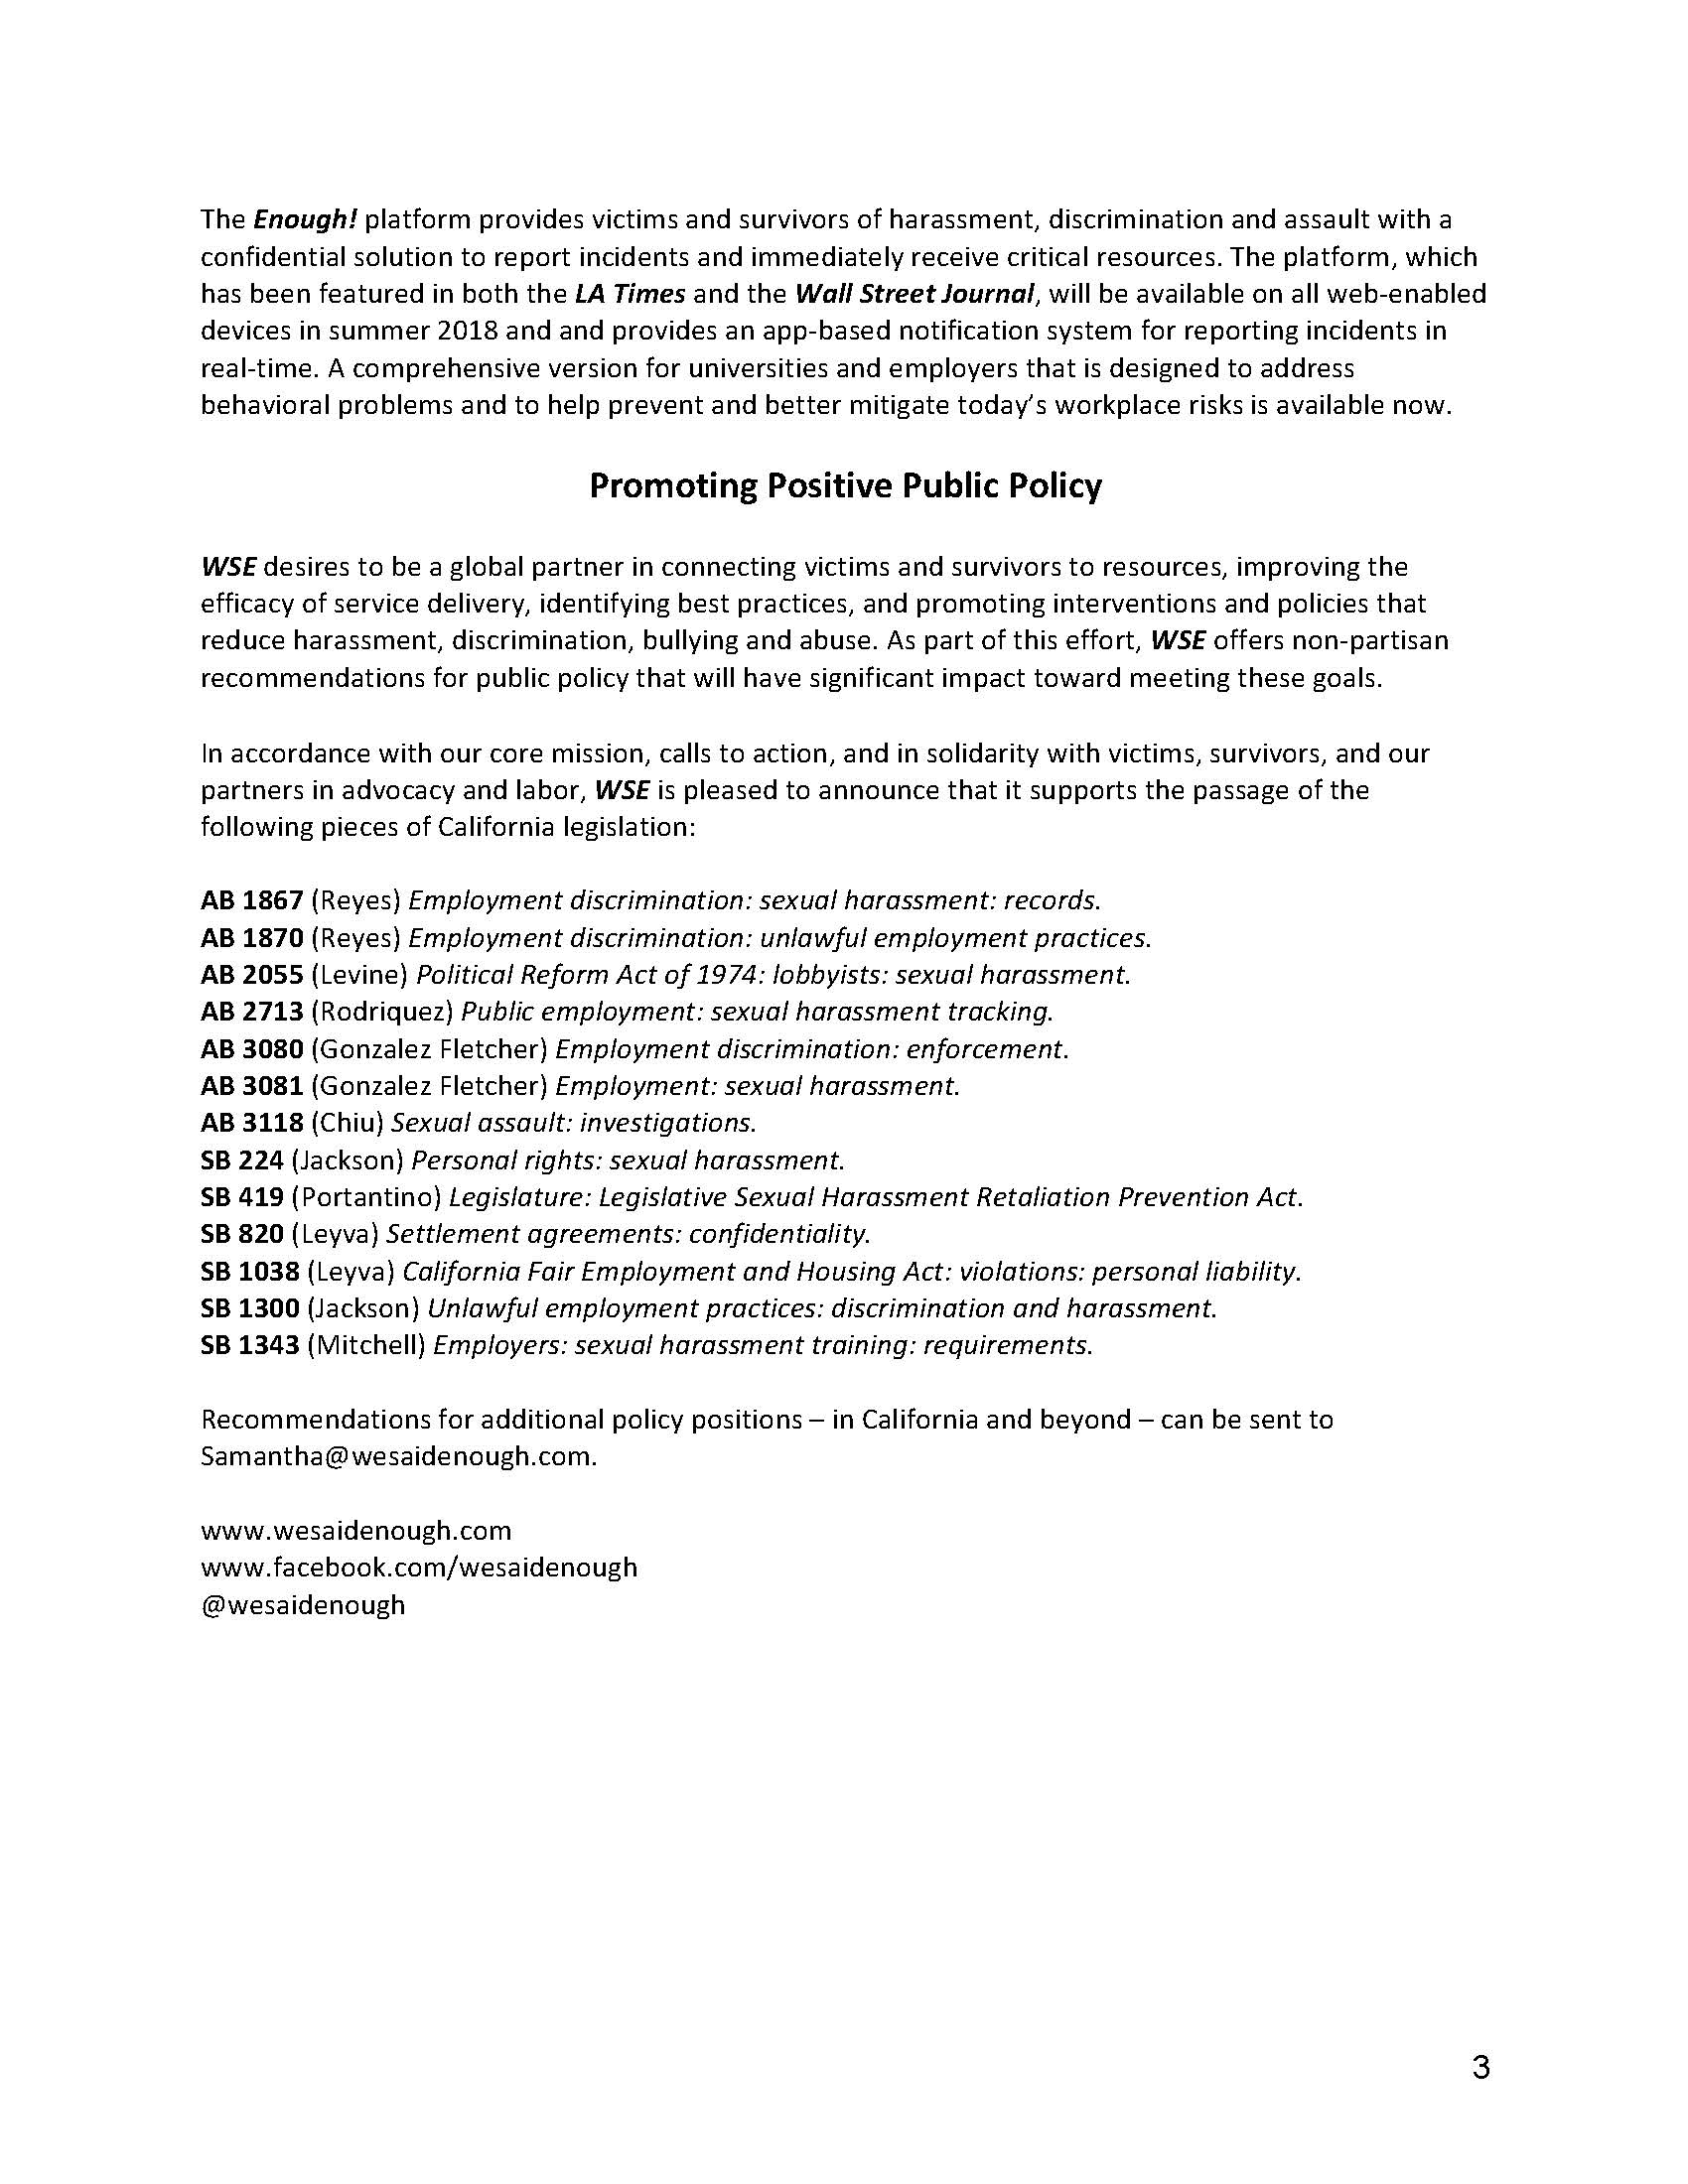 Press Release 4.30.18_Page_3.jpg